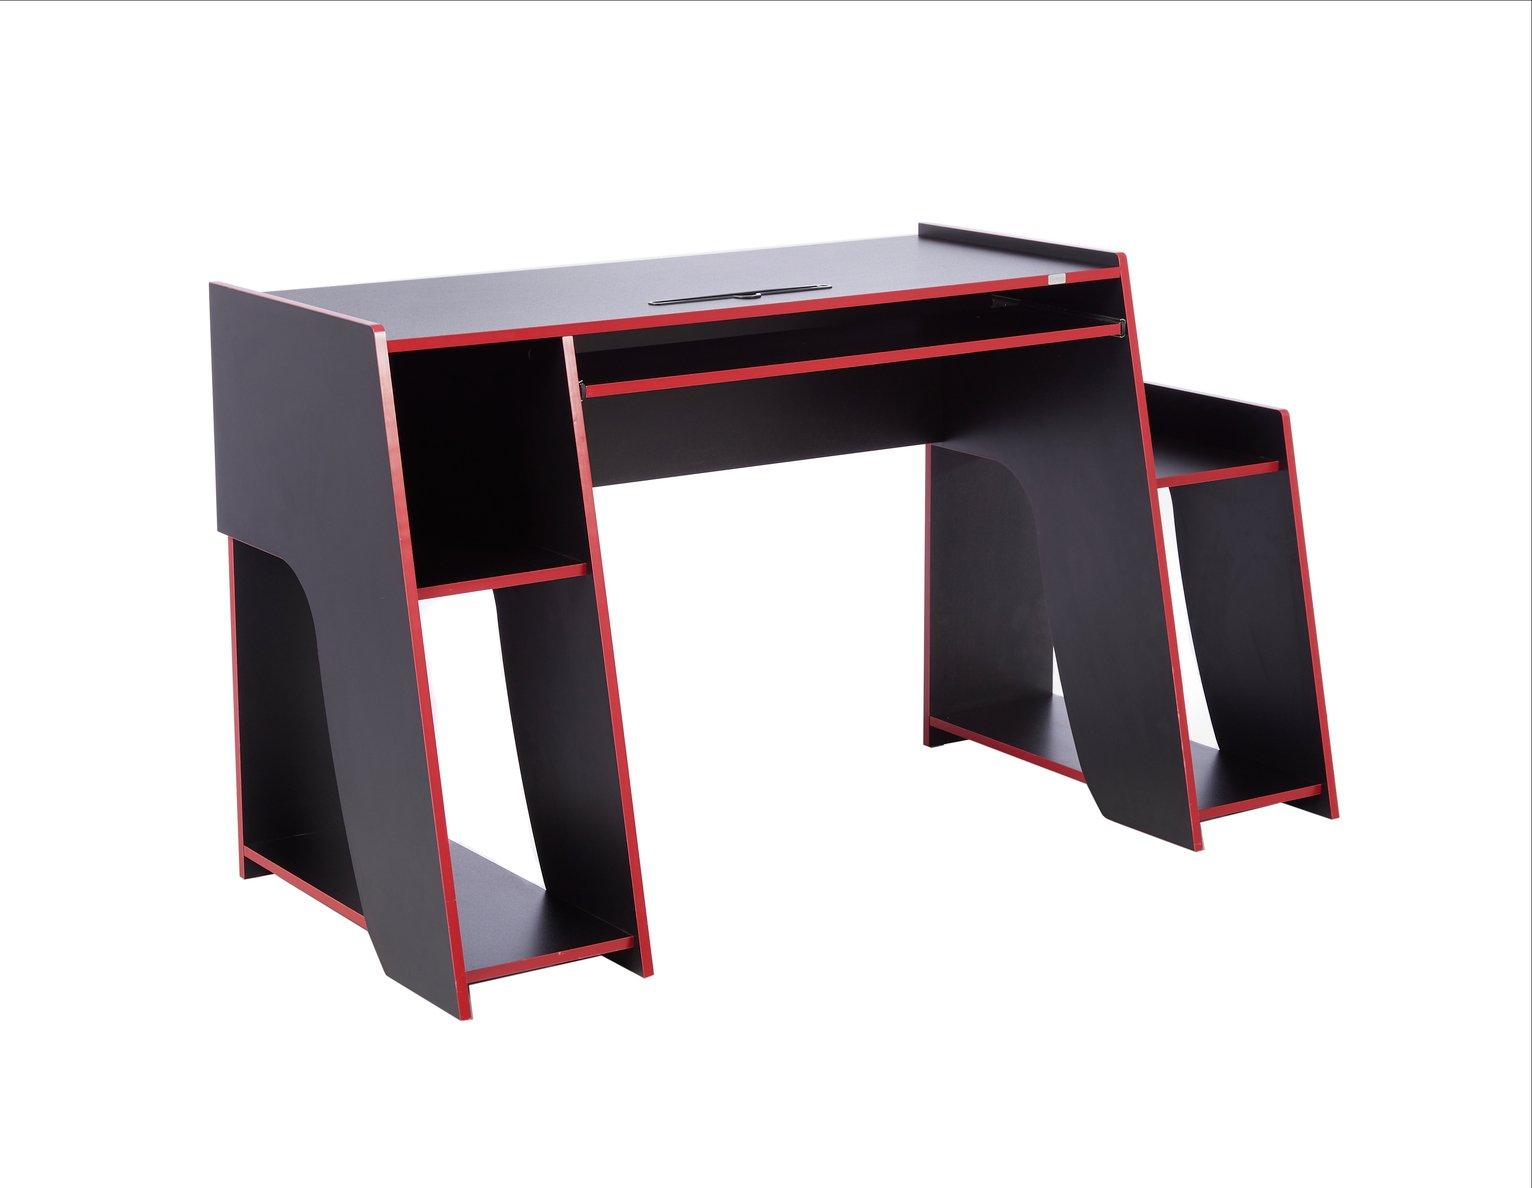 Virtuoso Horizon Gaming Desk - Red and Black